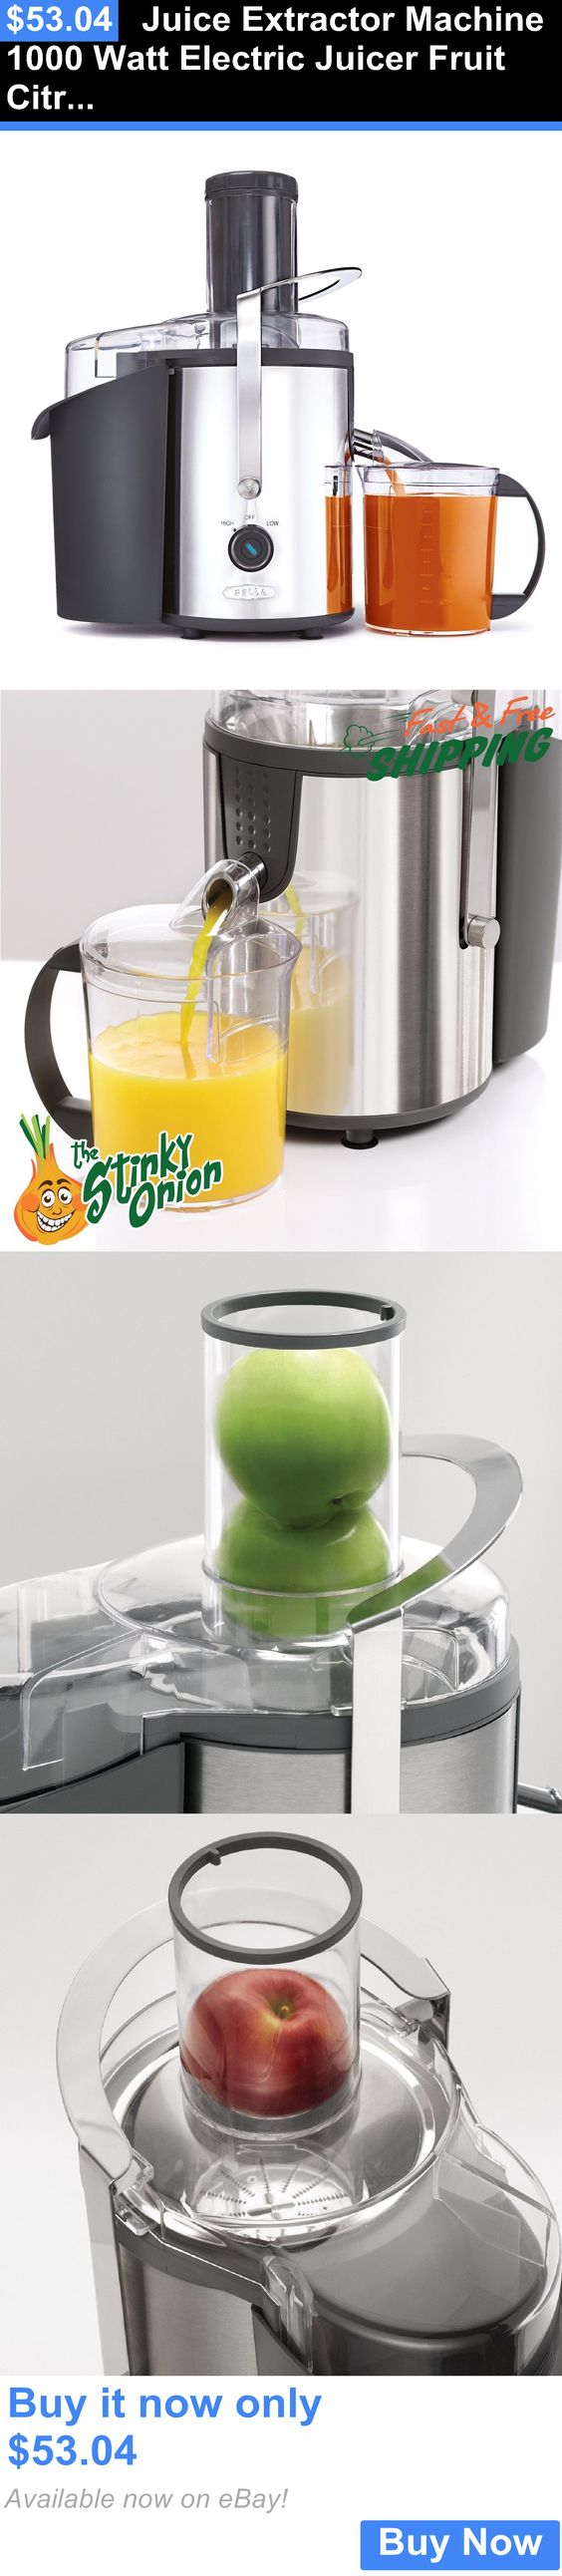 5l accents range only electricals co uk small kitchen appliances - Small Kitchen Appliances Juice Extractor Machine 1000 Watt Electric Juicer Fruit Citrus Squeezer Buy It